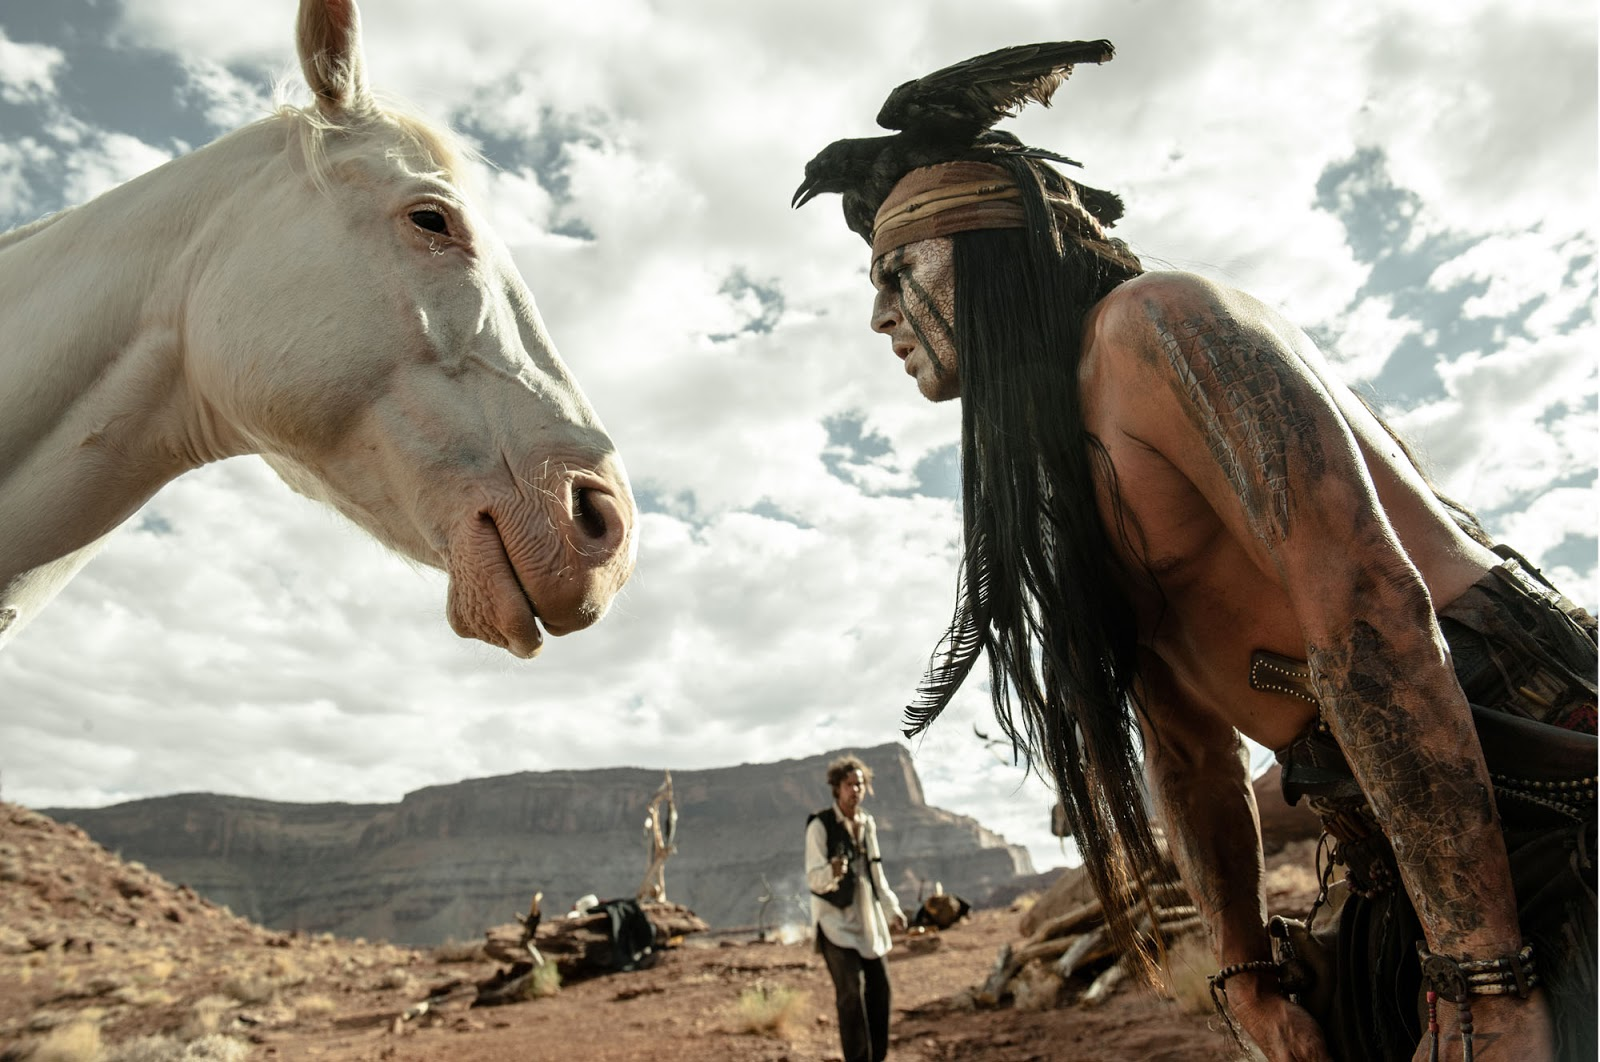 http://2.bp.blogspot.com/-mOE3I1qKezk/UQuy8vzTV5I/AAAAAAAA1ao/R6RNi_ULvd4/s1600/CavaleiroSolitario_Depp+el+llanero+solitario+remake+the+lone+ranger+armie+hammer+johnny+depp+caballo+horse+toro+tonto+indio+walt+disney+jerry+bruckheimer+3+july+julio+2013+live+action+captura+screencaps+still+promo.jpg